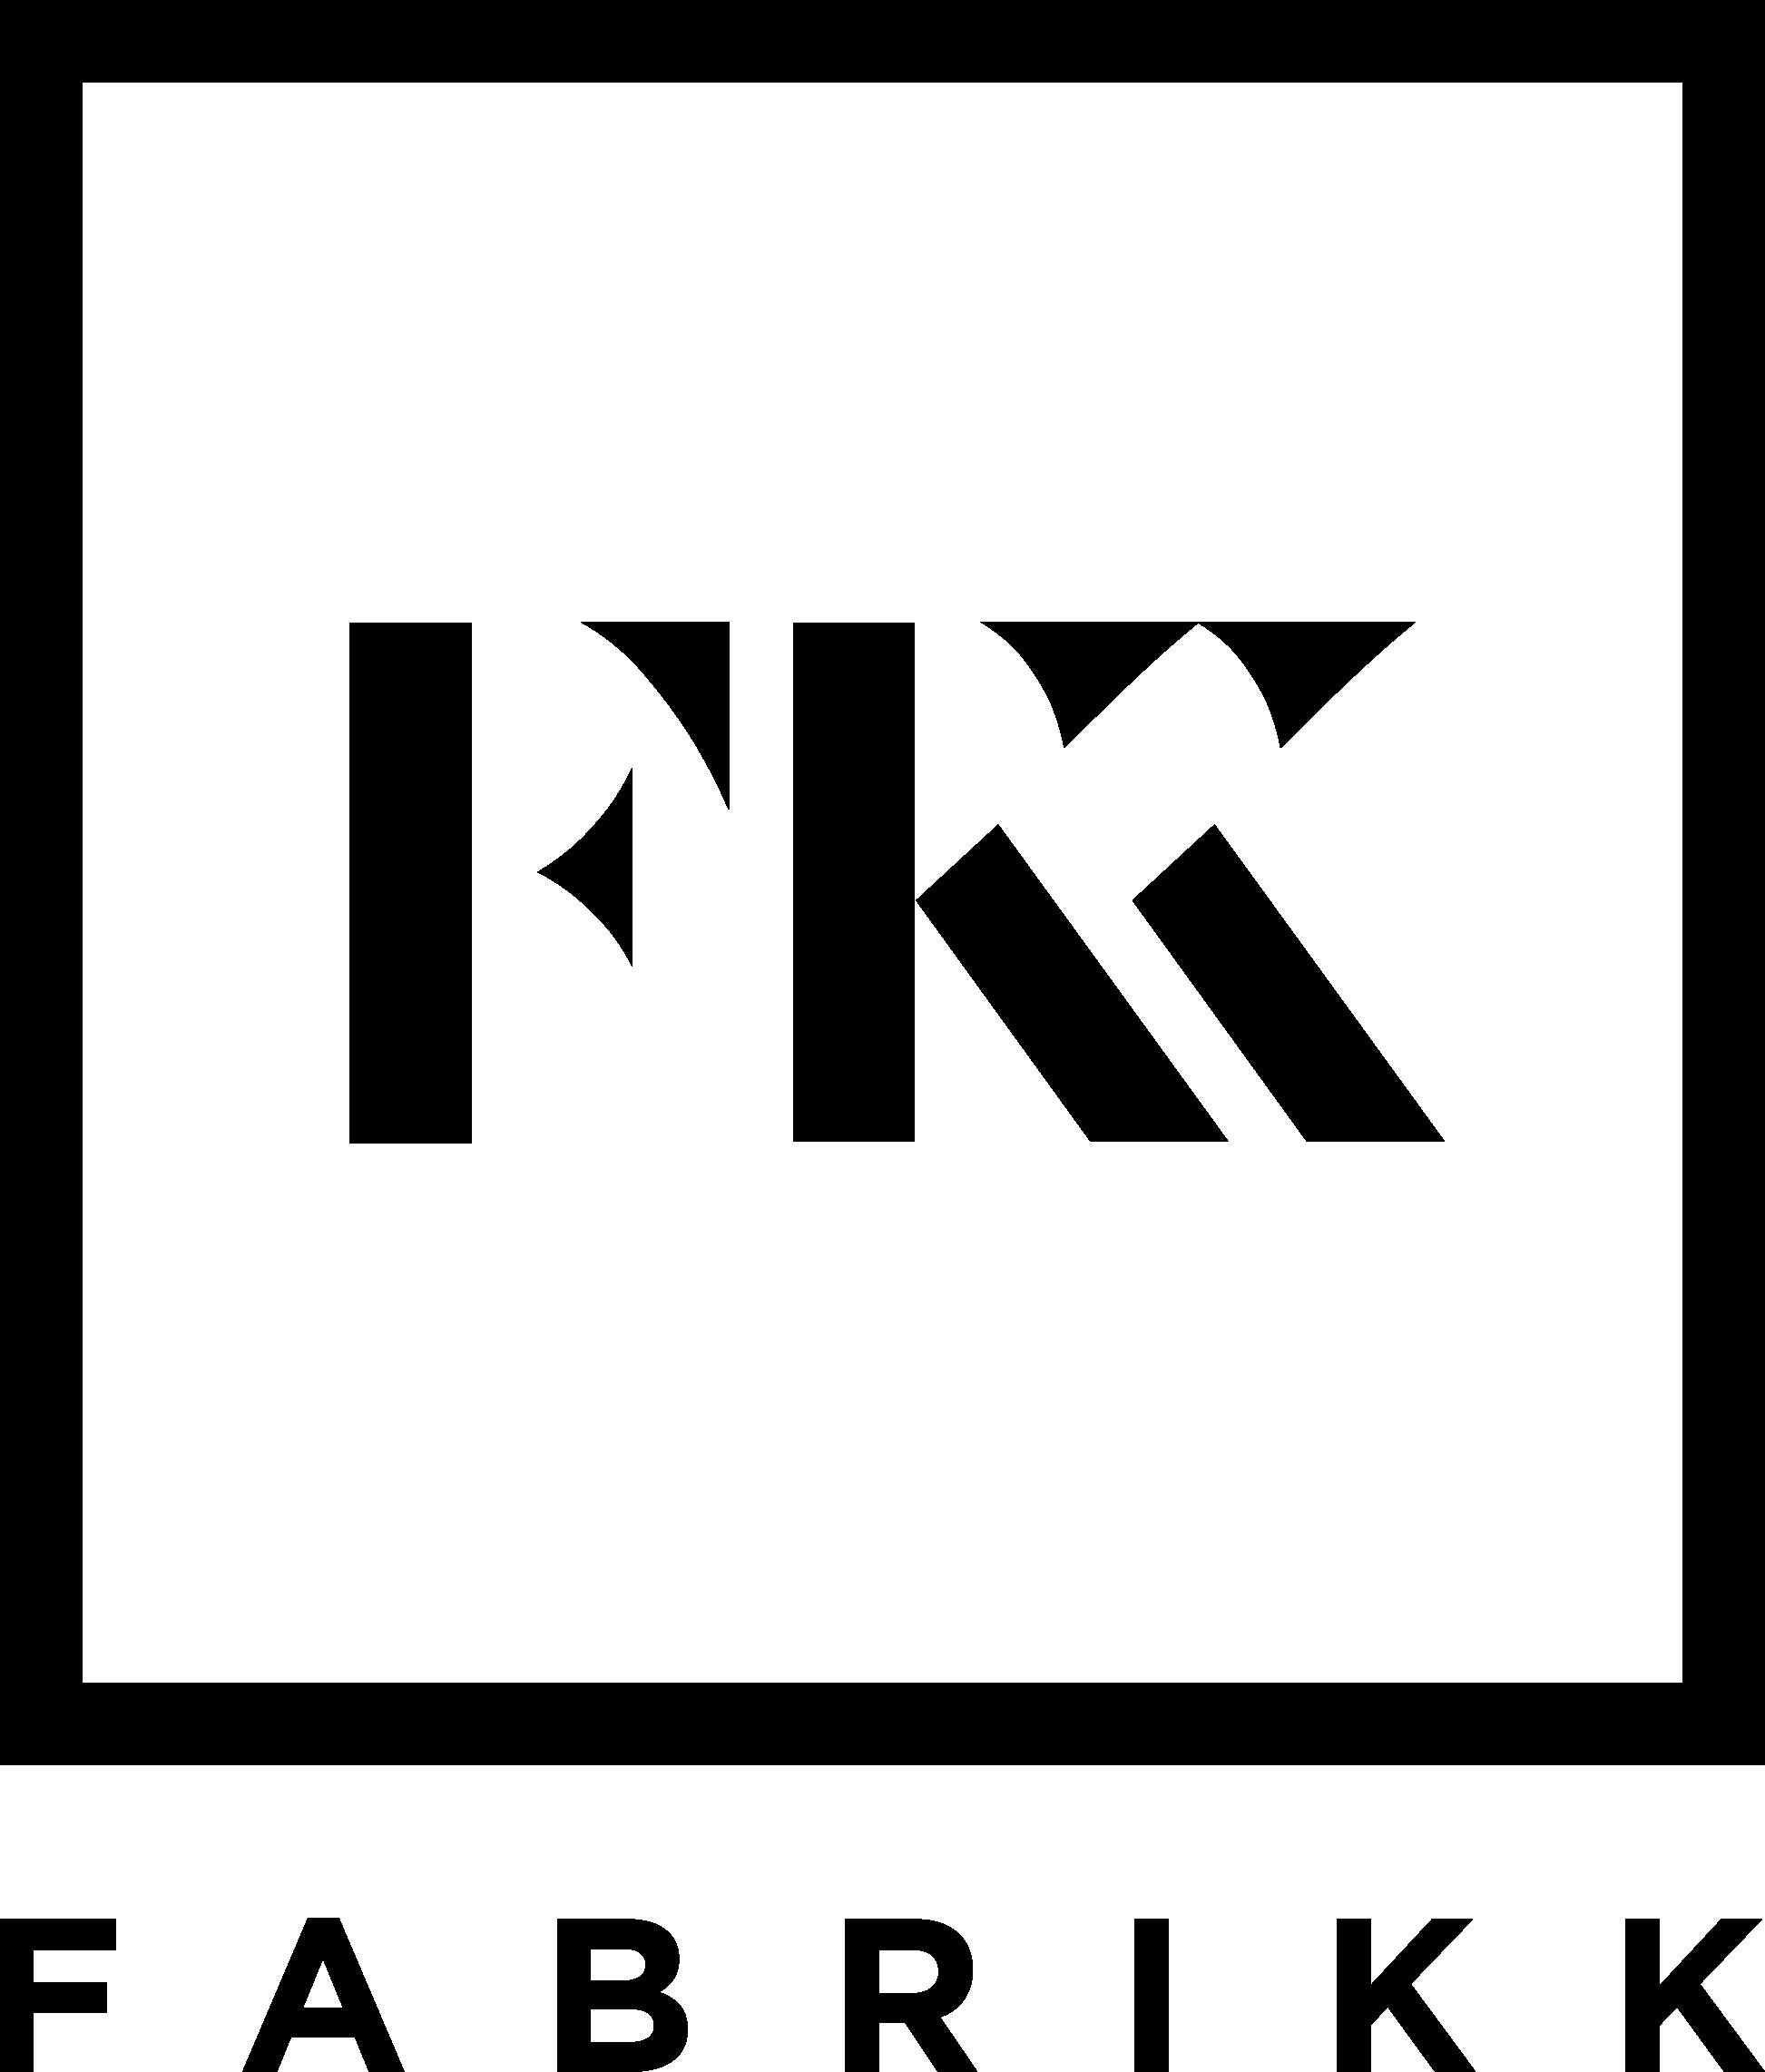 fabrikk_logo_final_small B&W.png